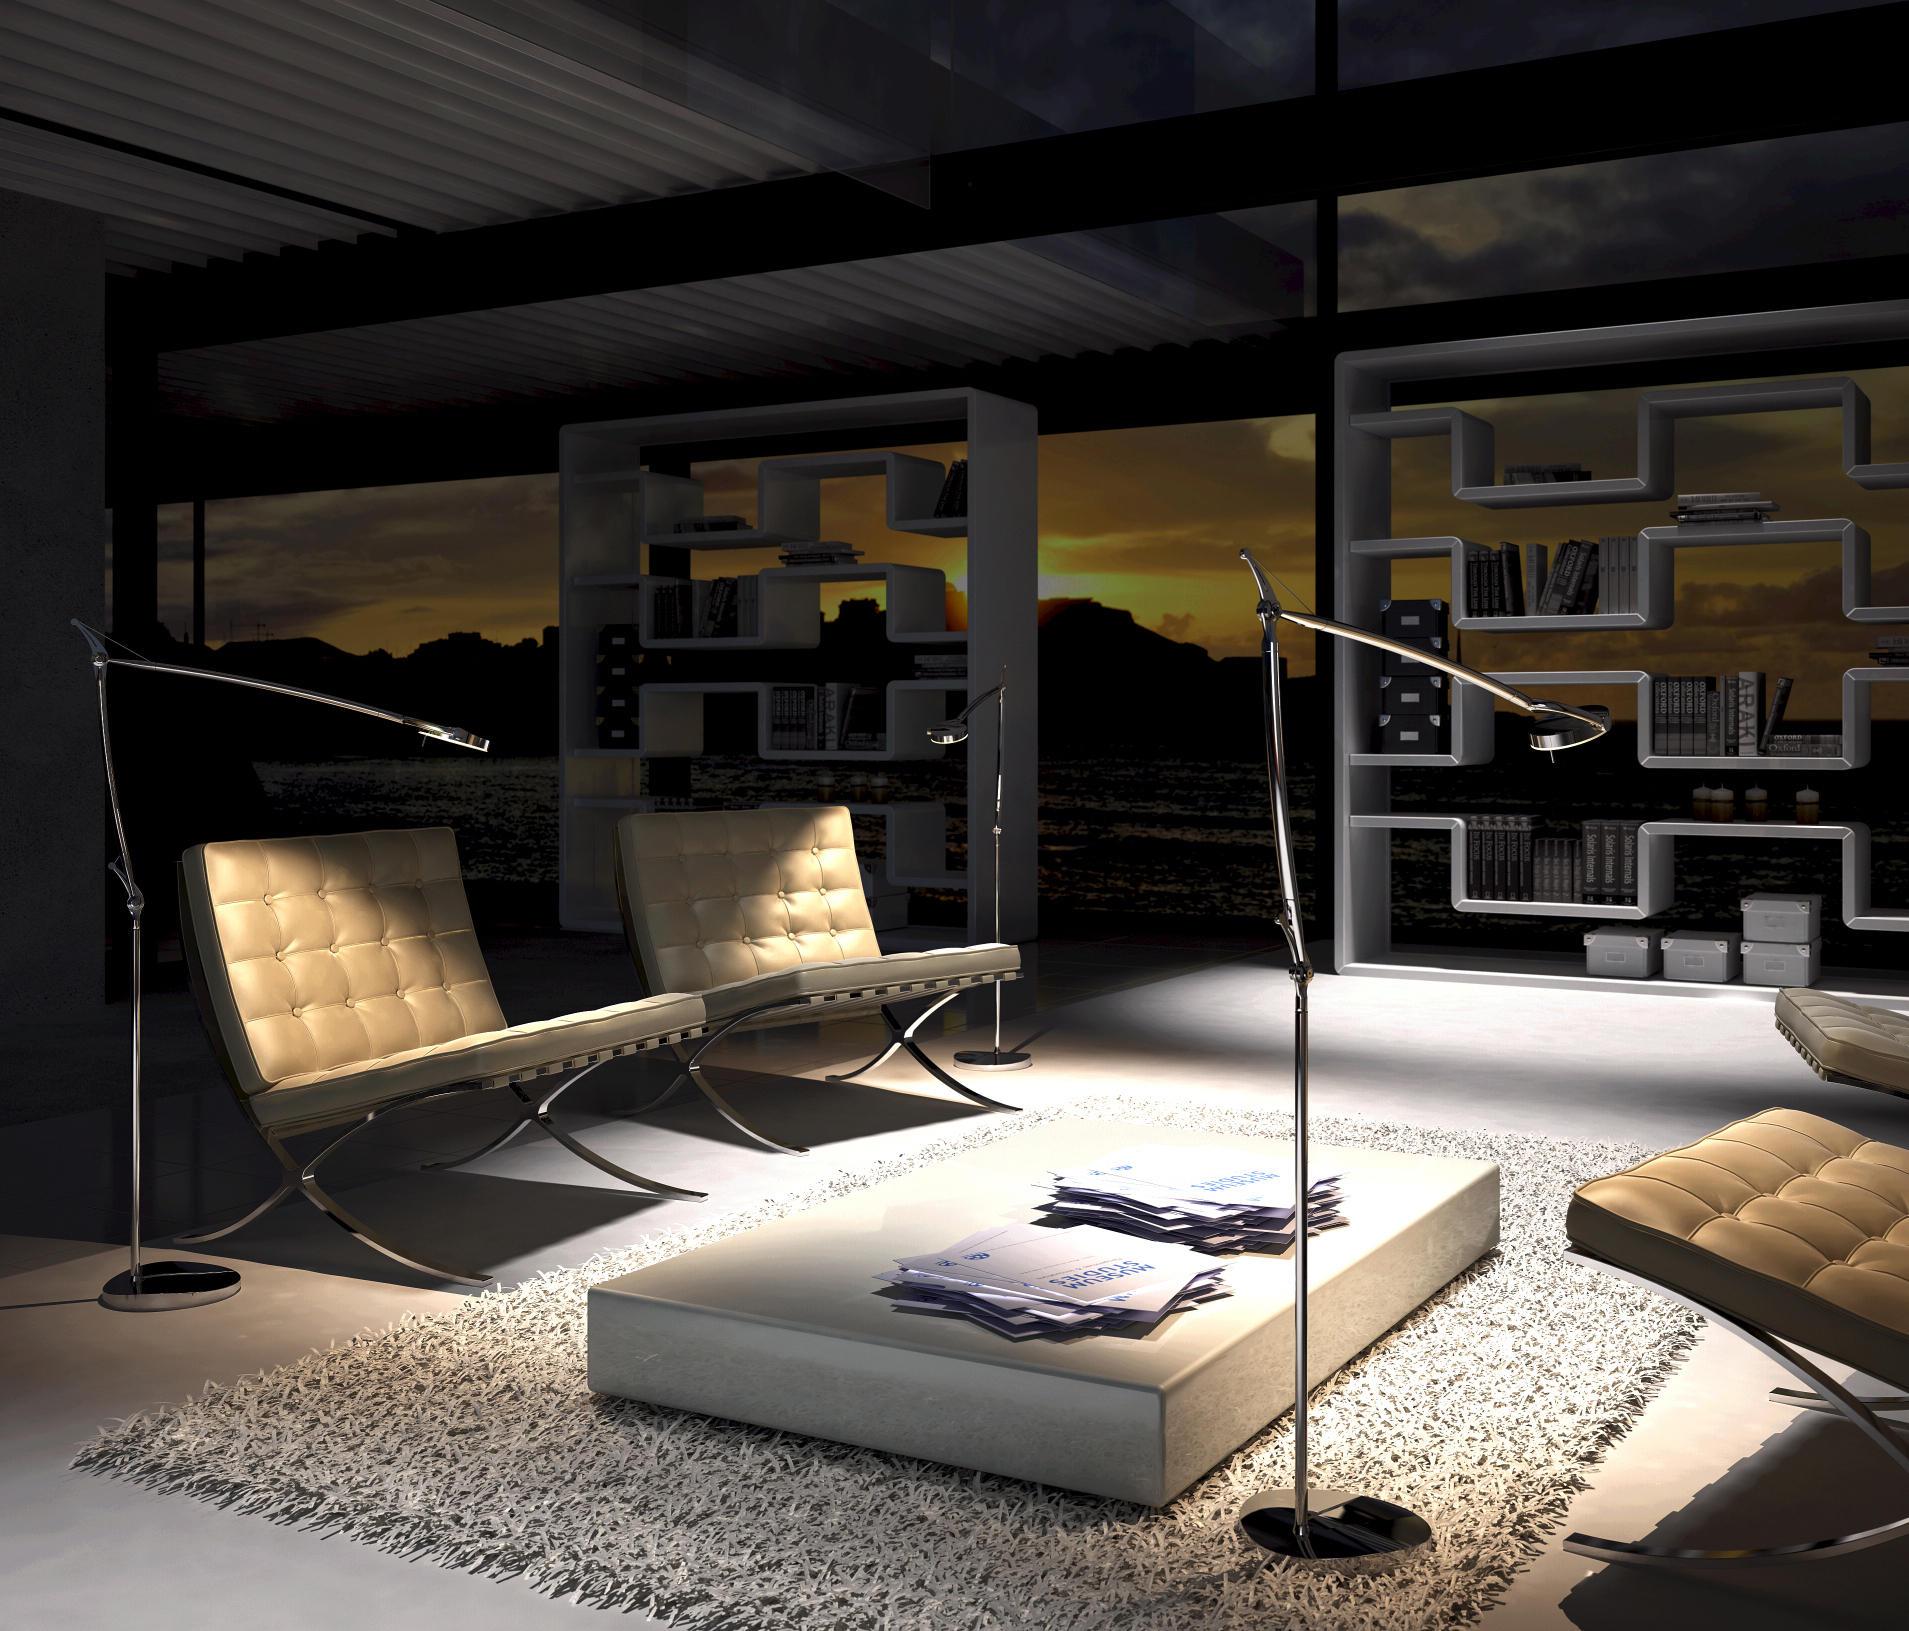 Milan iluminacion perceval l mpara de pie led 3x4w 6349 - Iluminacion de pie ...